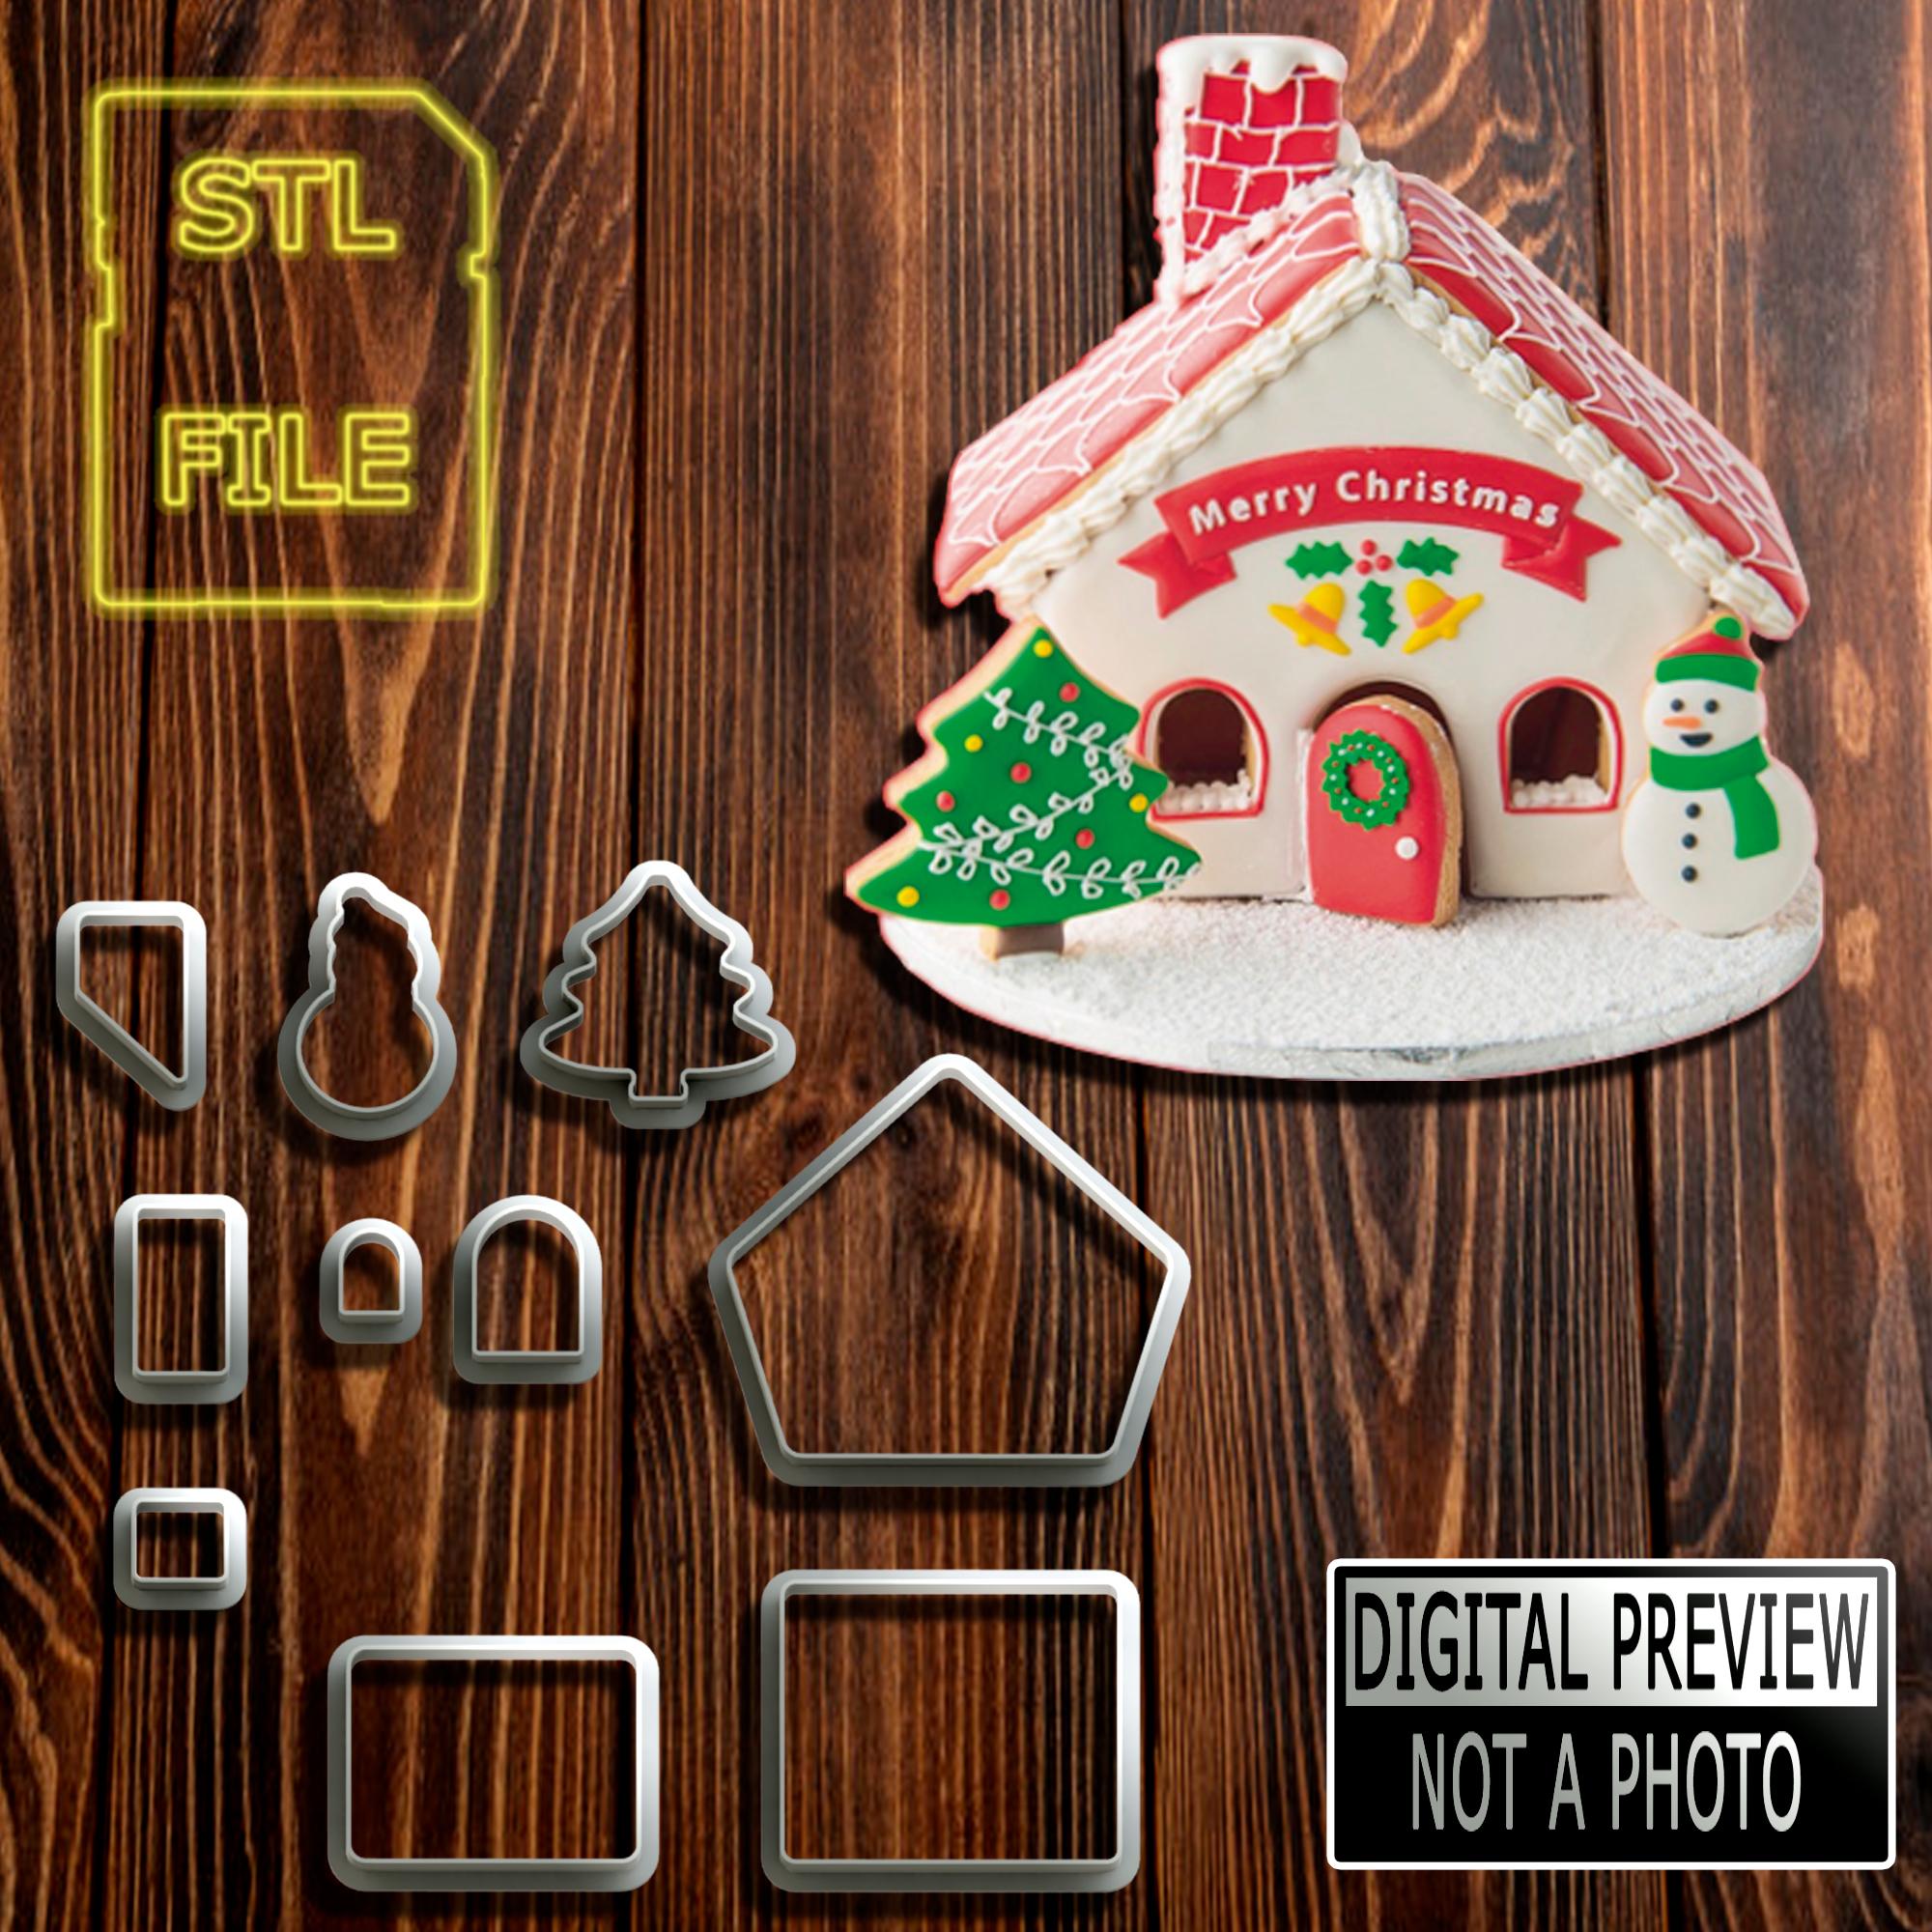 Casa 3d Modelo 2.jpg Download STL file [10% OFF] 3D HOUSE COOKIE CUTTER - CHRISTMAS THEME • 3D print object, Jean_Nascimento